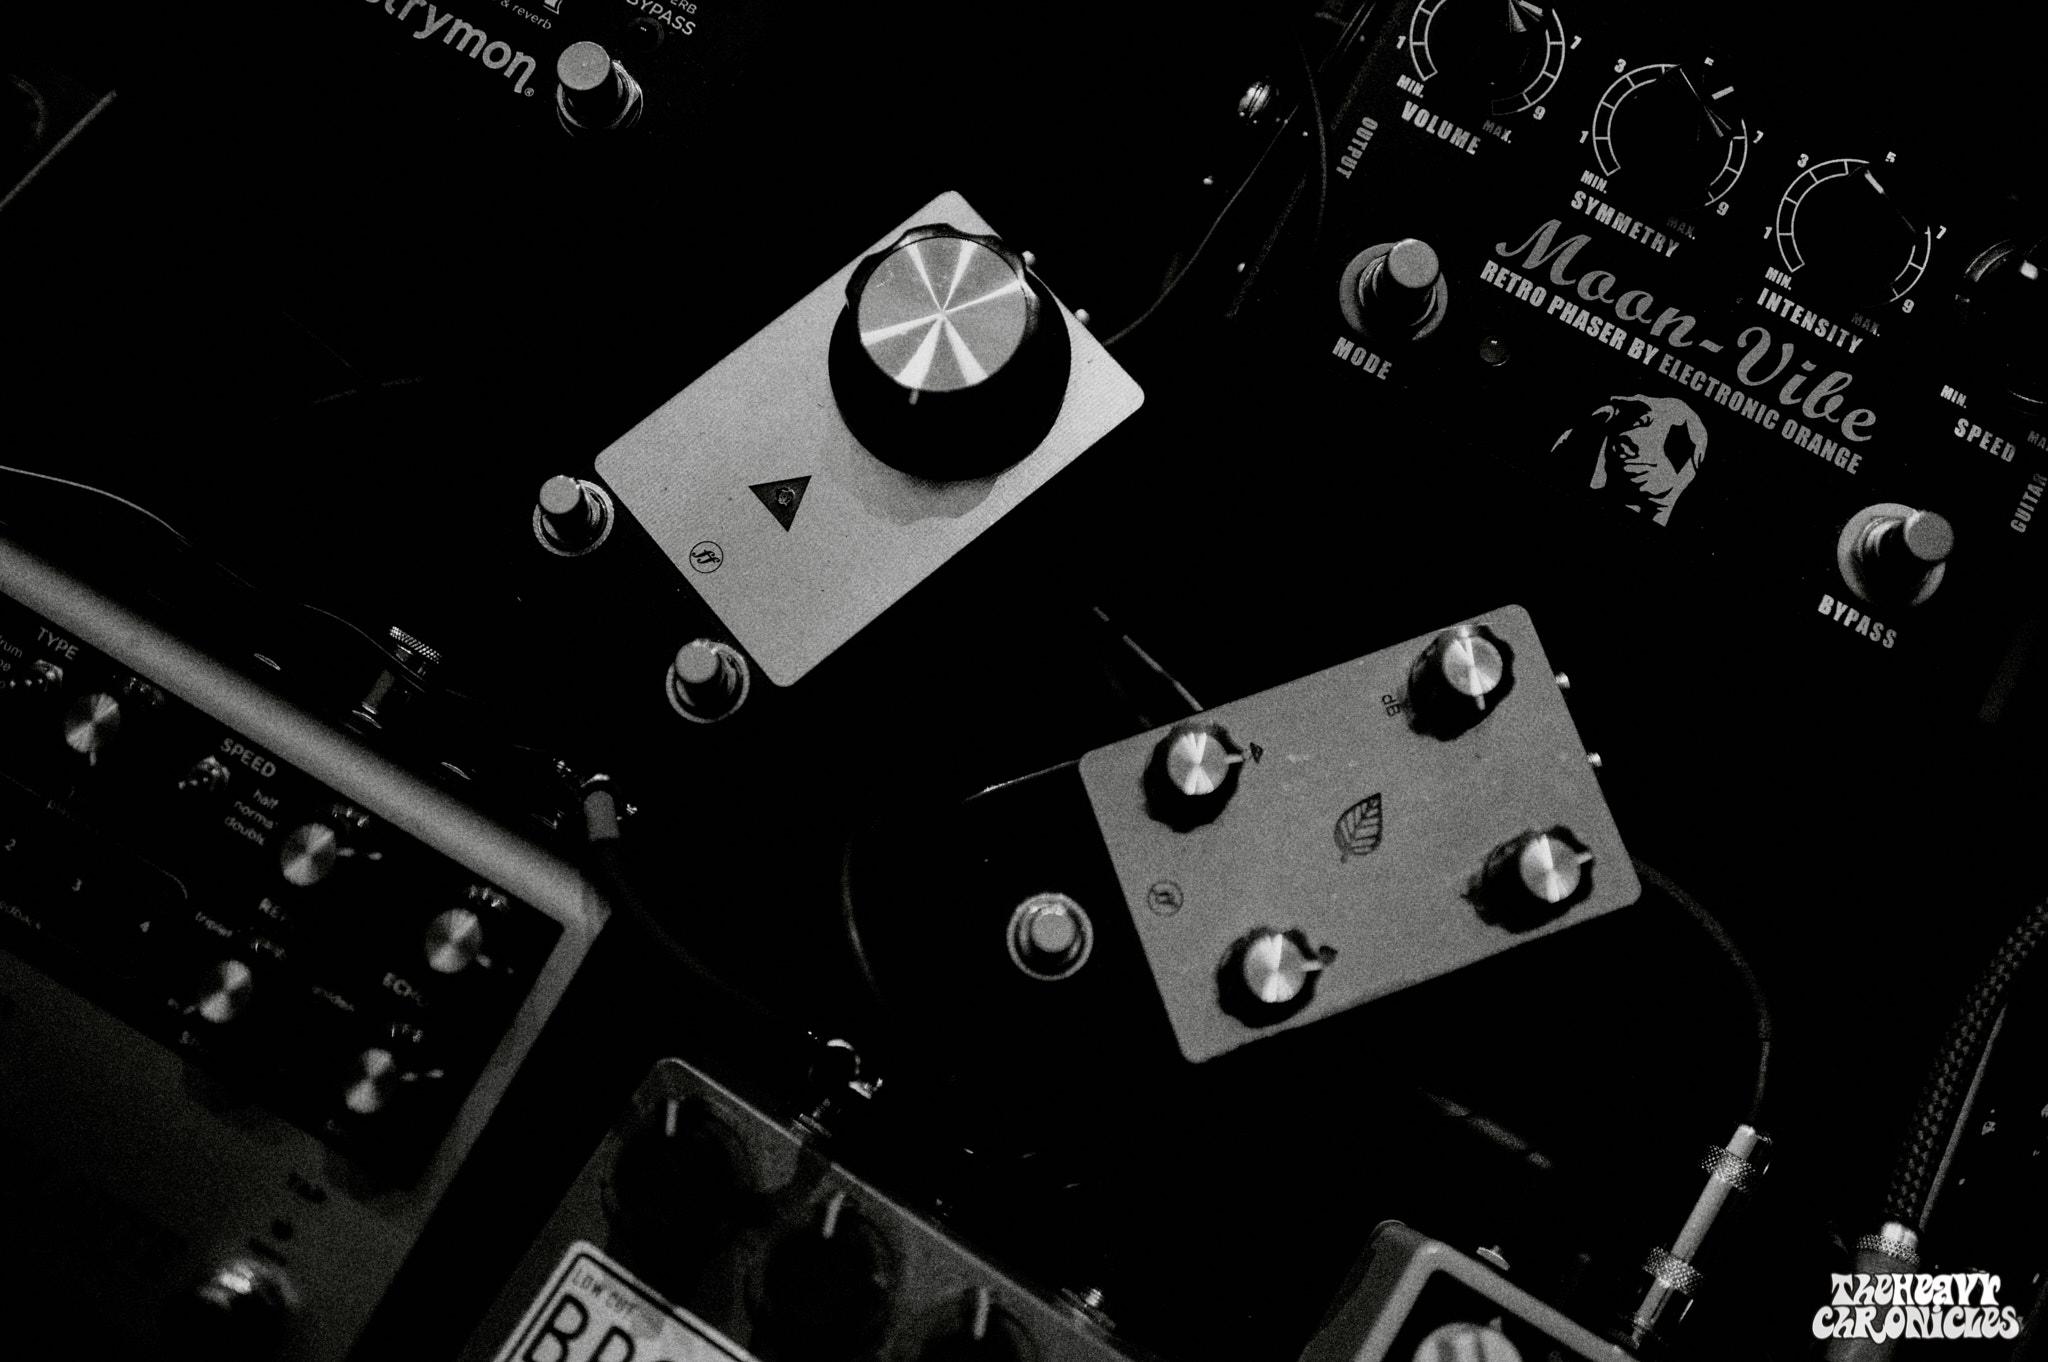 Elder-Studio-Black-Box-2019-Gael-Mathieu-The-Heavy-Chronicles-27